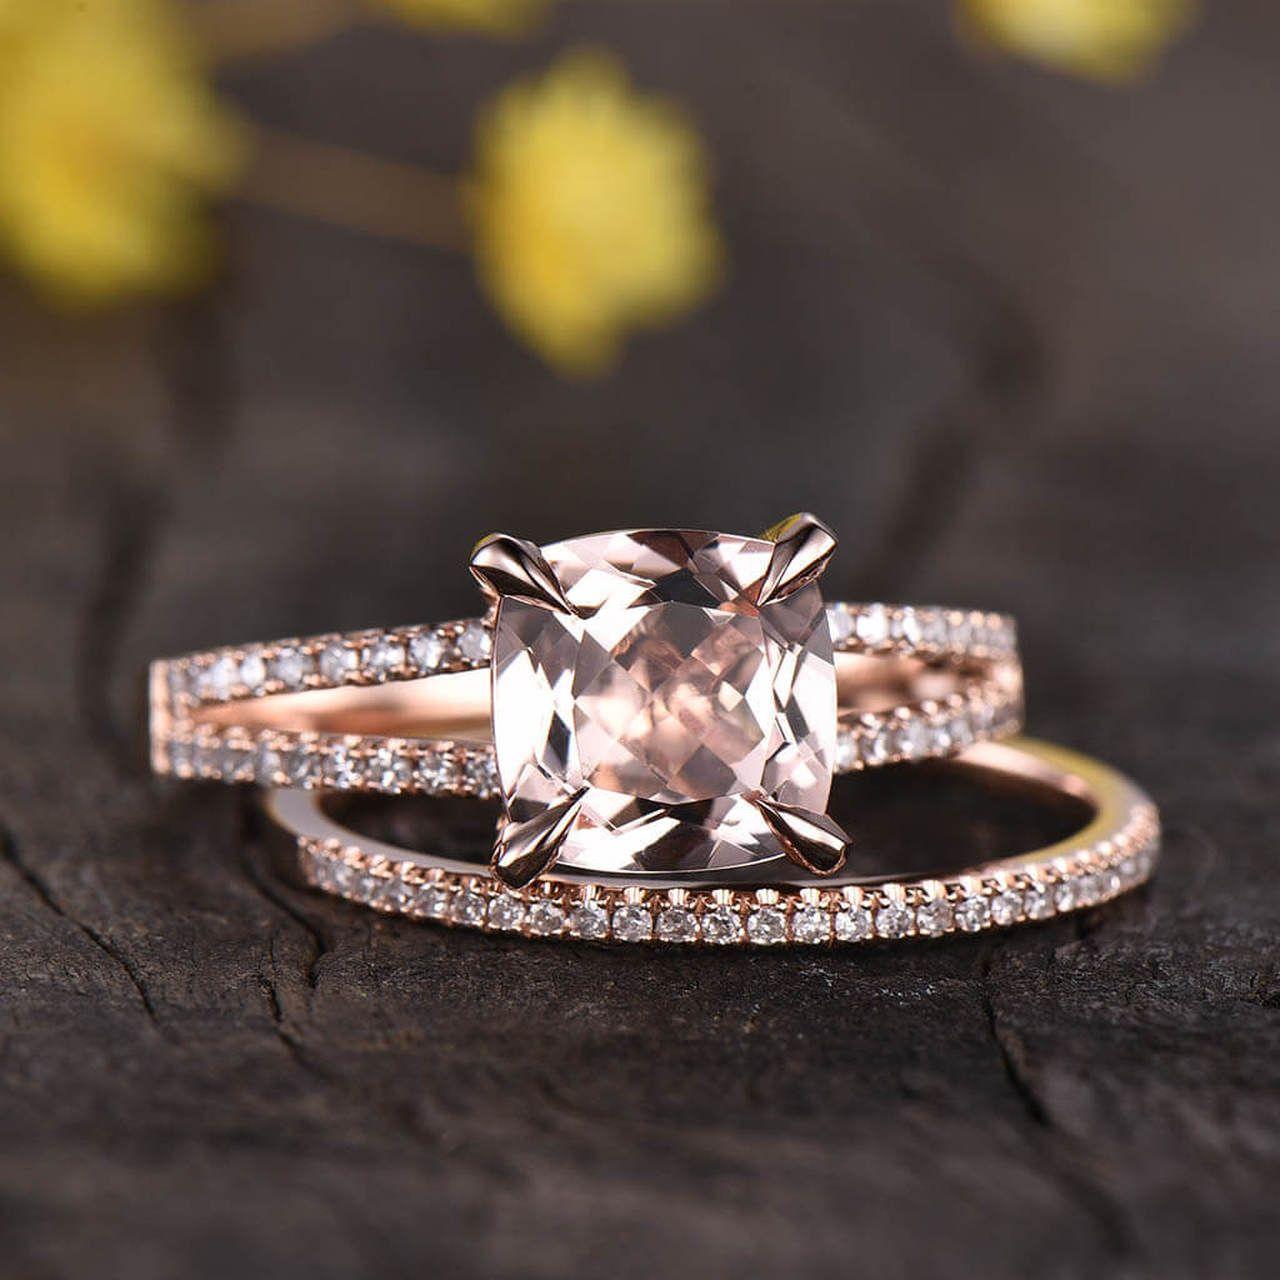 14k 18k Gold Cushion Morganite Engagement Ring Diamond Wedding Set In 2020 Morganite Engagement Ring Diamond Wedding Sets Morganite Engagement Ring Set